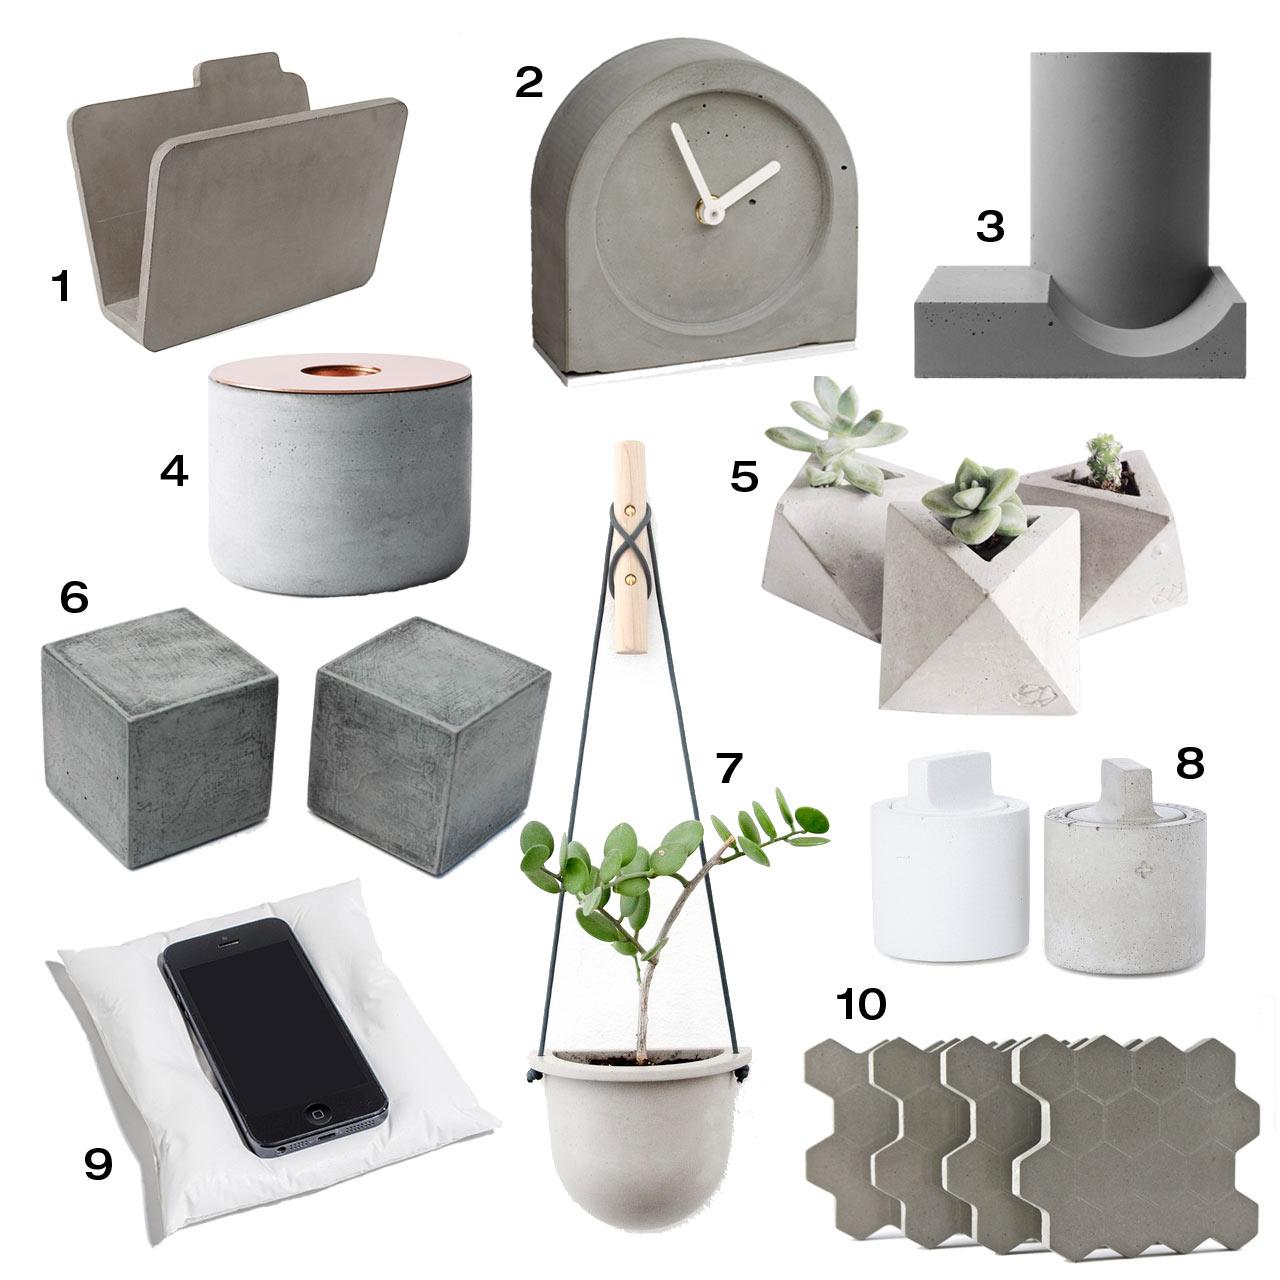 Modern Home Design Accessories photo - 3